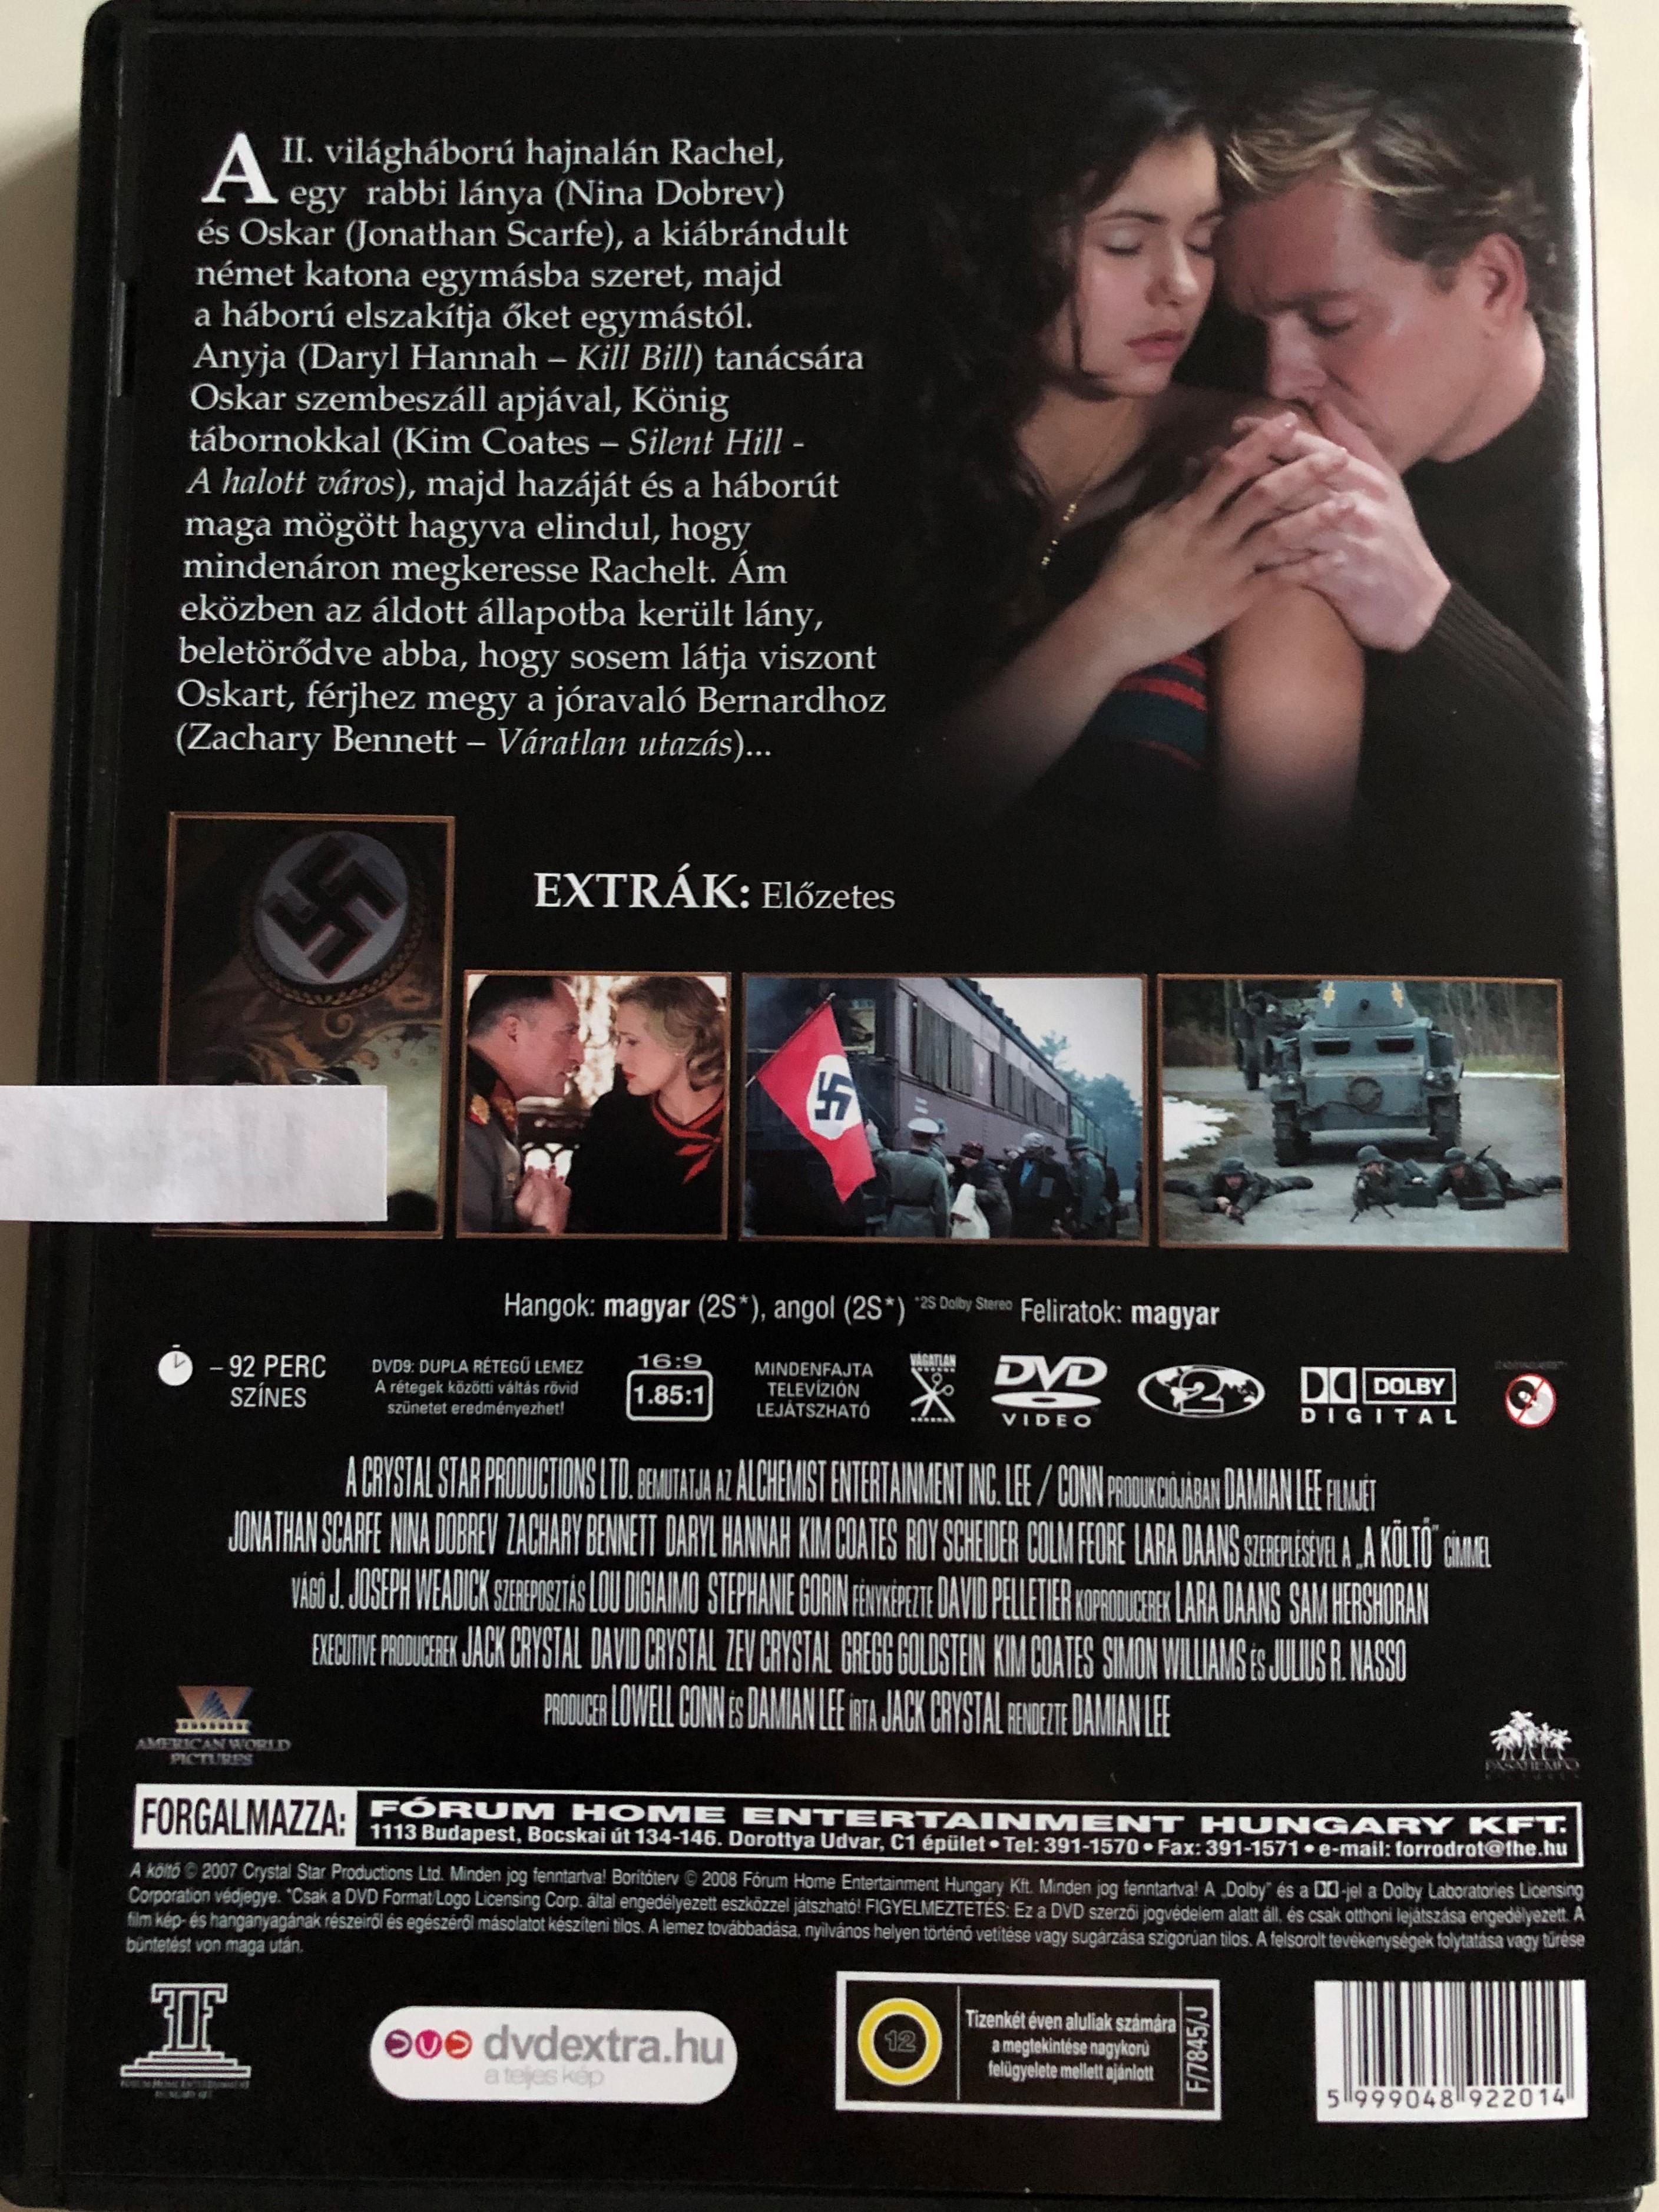 the-poet-dvd-2007-a-k-lt-directed-by-damian-lee-starring-jonathan-scarfe-nina-dobrev-zachary-bennett-daryl-hannah-kim-coates-2-.jpg